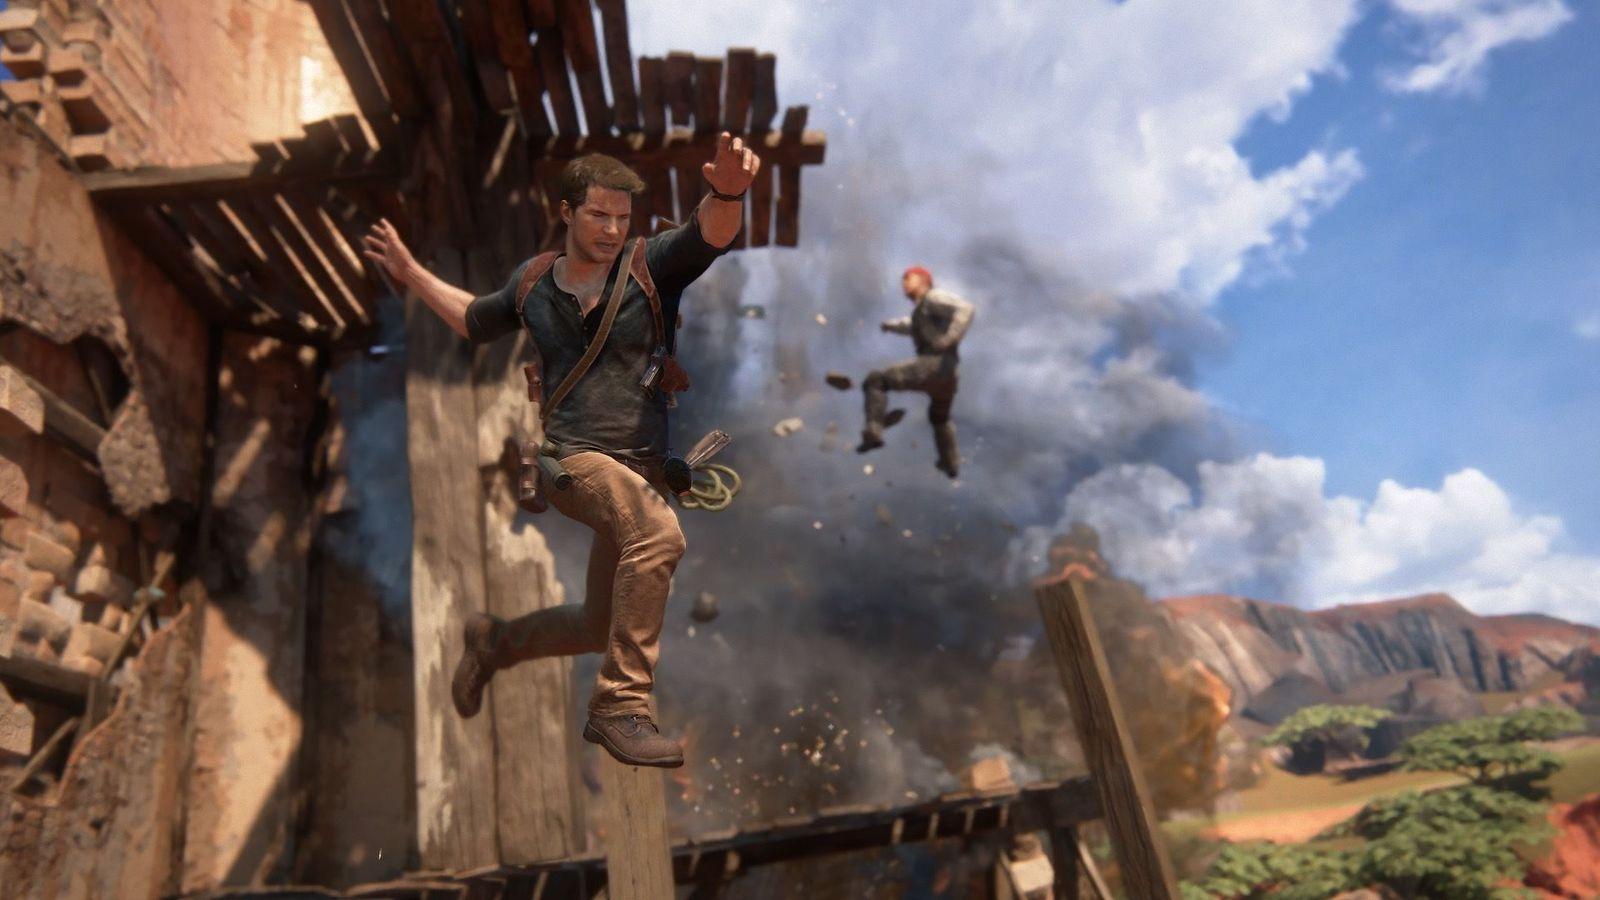 Uncharted 4: A Thief's End. Видео-обзор + Текстовая версия от zoxan'a (slowpoke edition) - Изображение 5